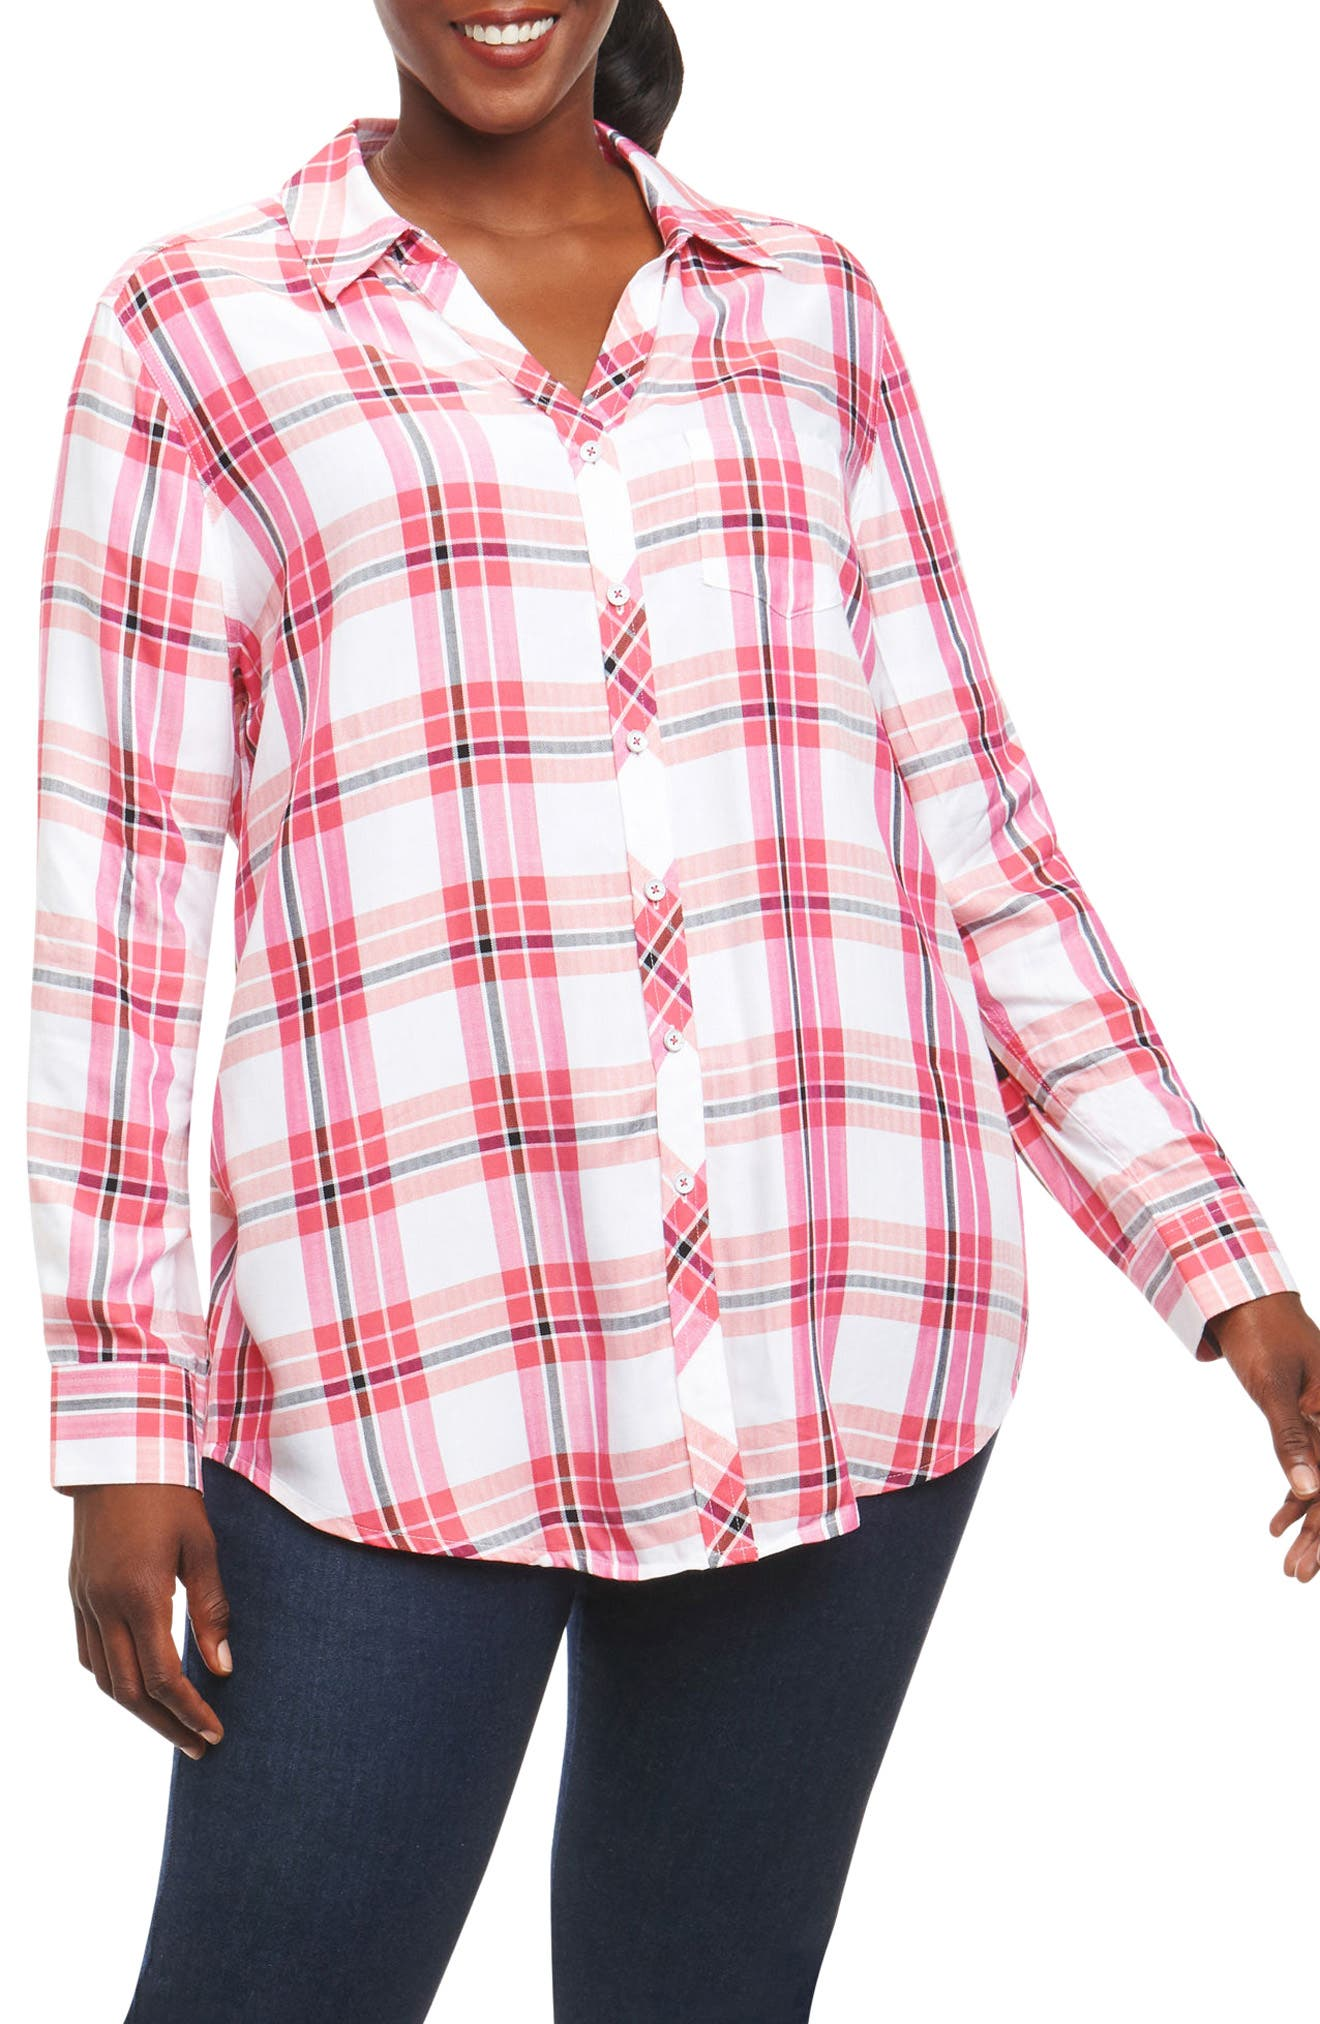 Alternate Image 1 Selected - Foxcroft Fay Plaid Shirt (Plus Size)